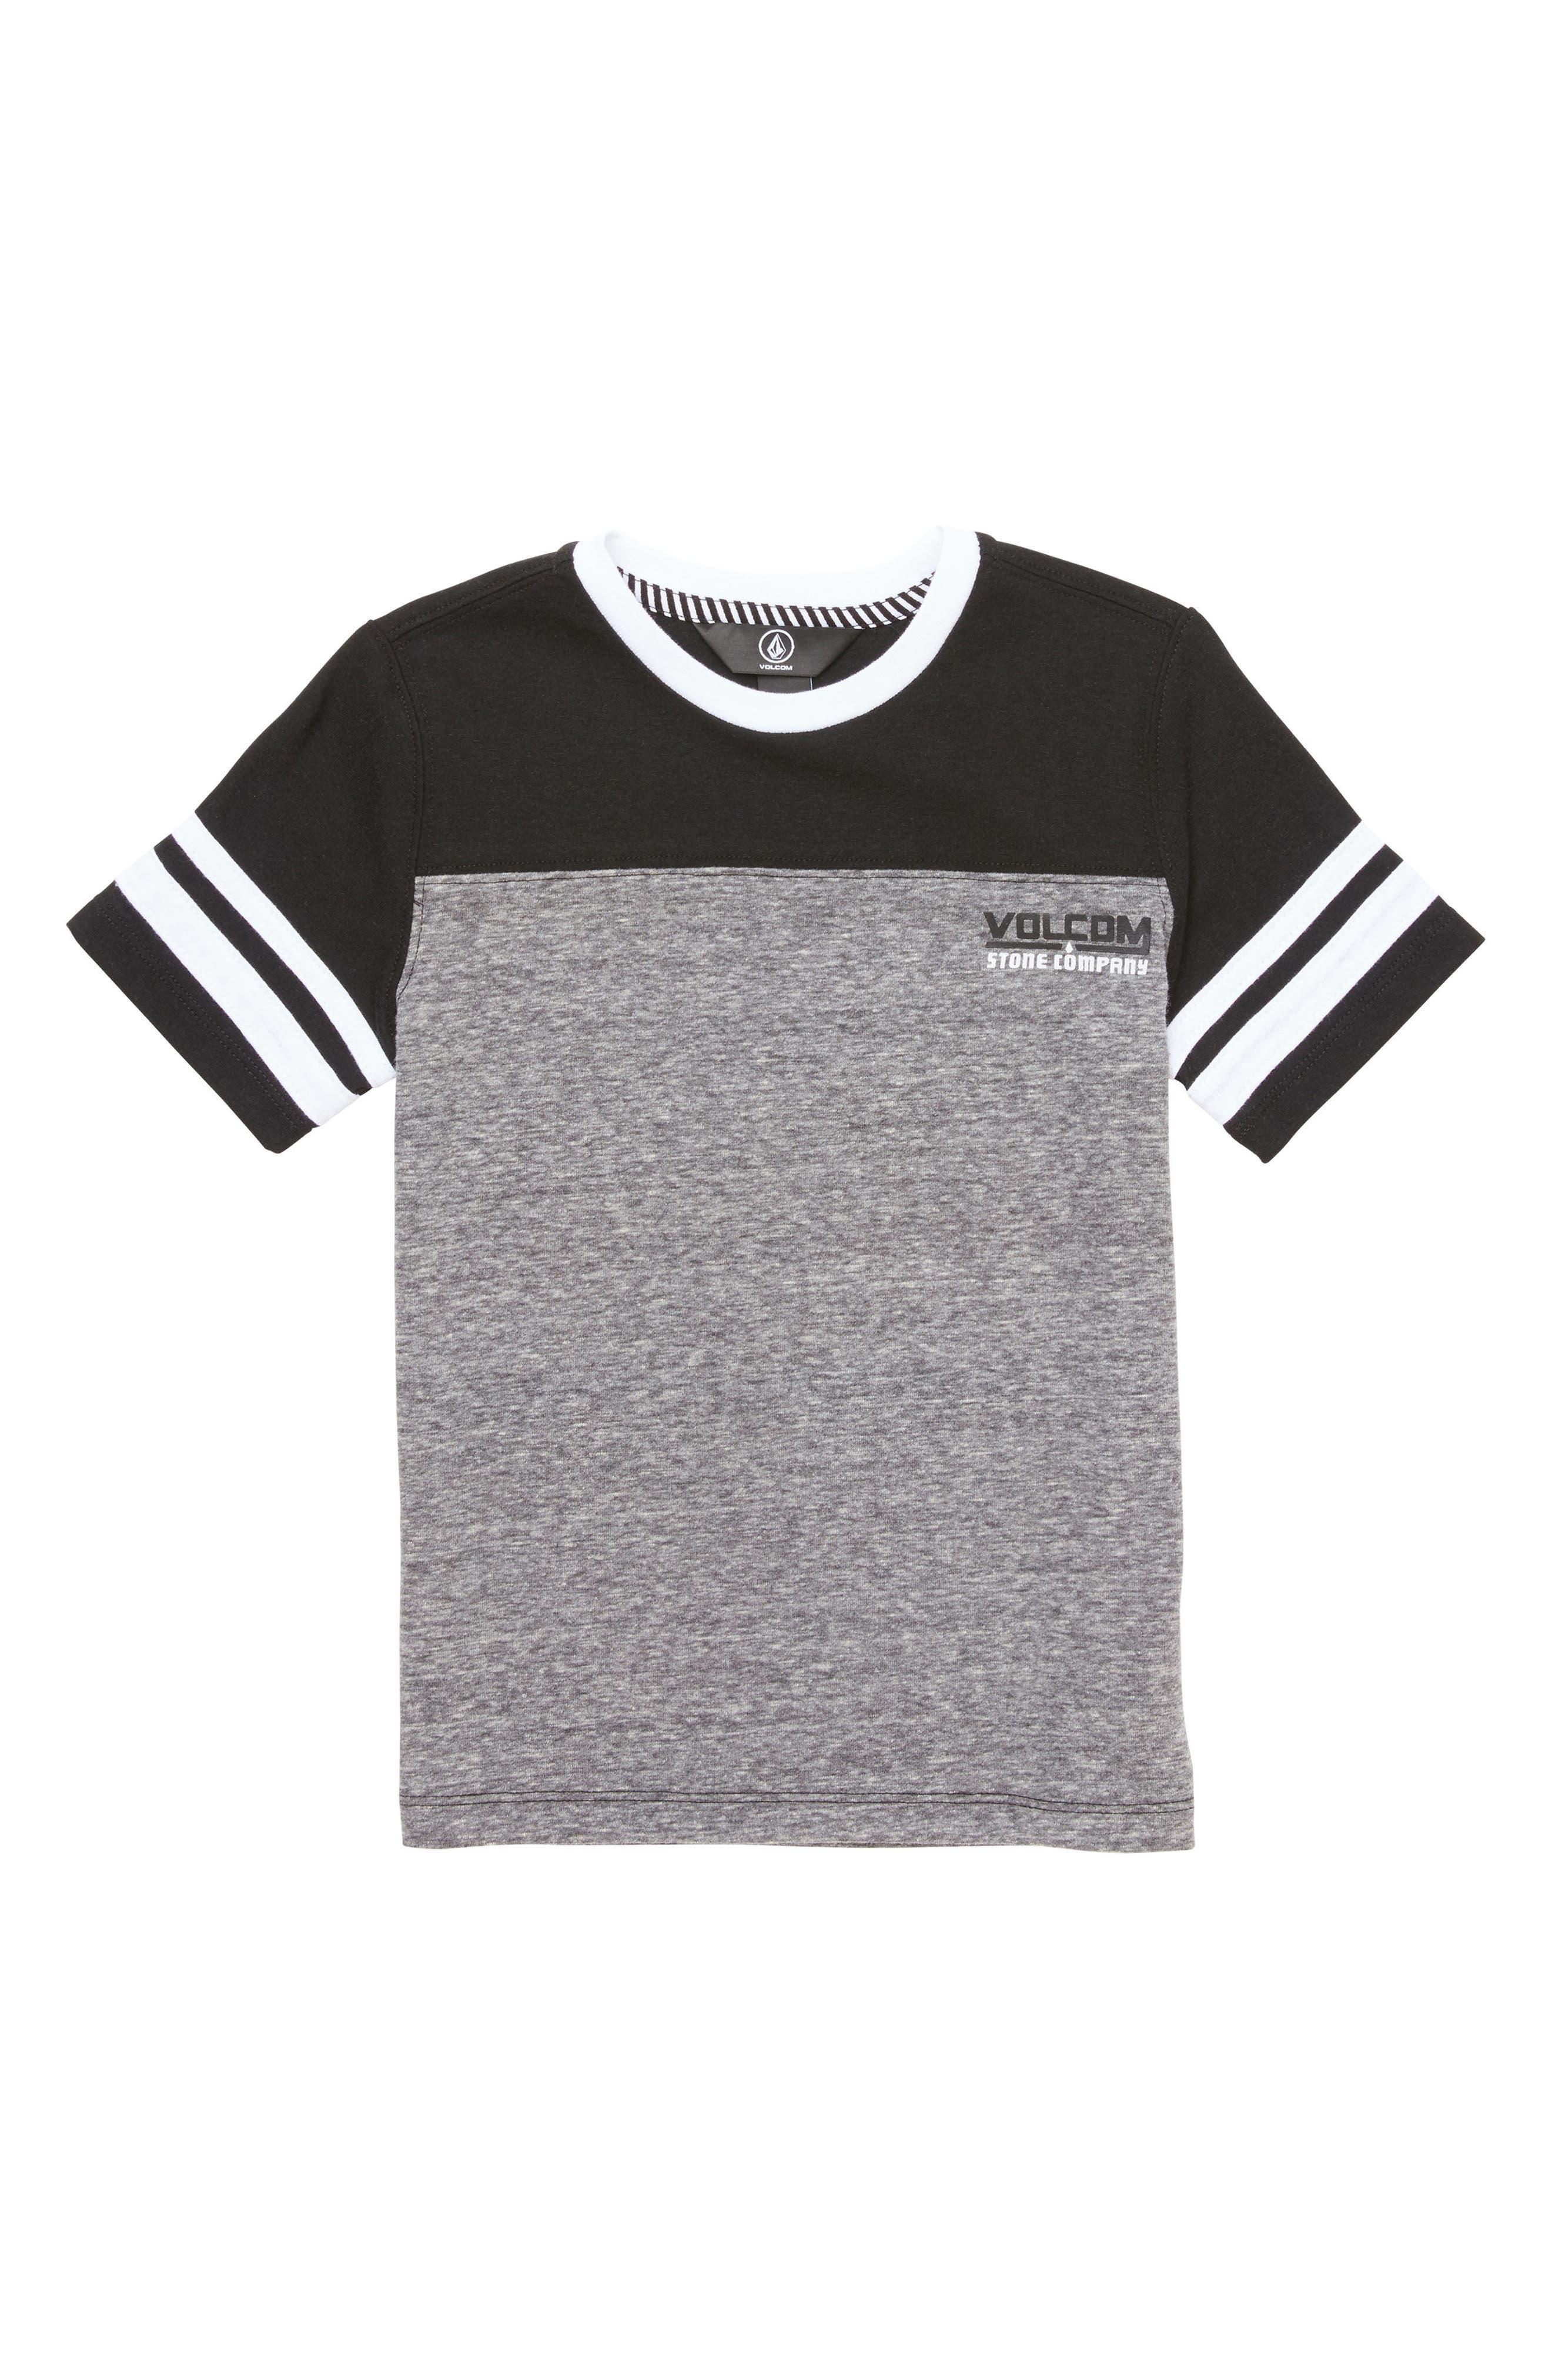 Walden Shirt,                         Main,                         color, Black